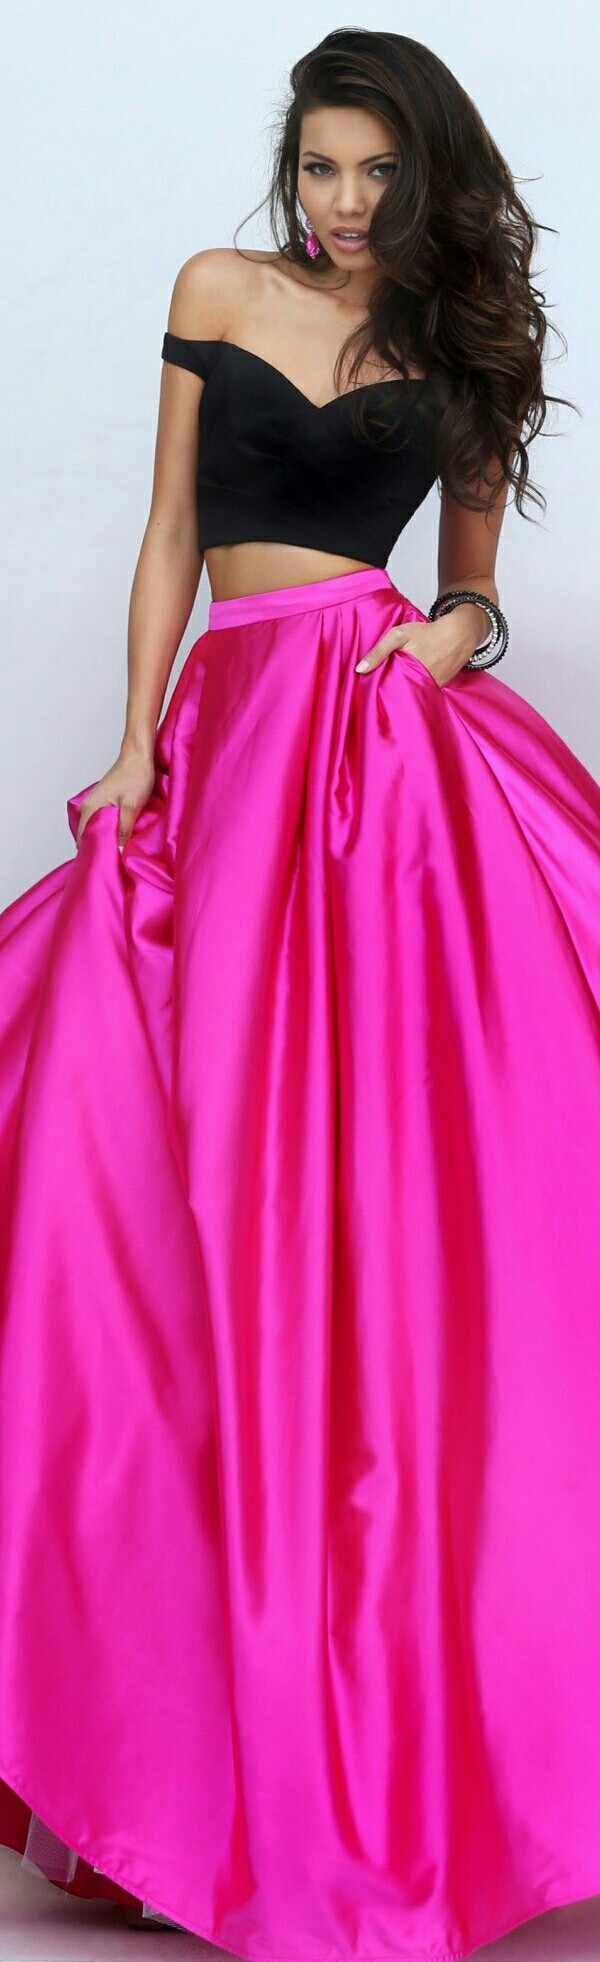 SHERRI HILL • In Hot Pink Shimmering Satin Flowing Skirt & Black Off ...